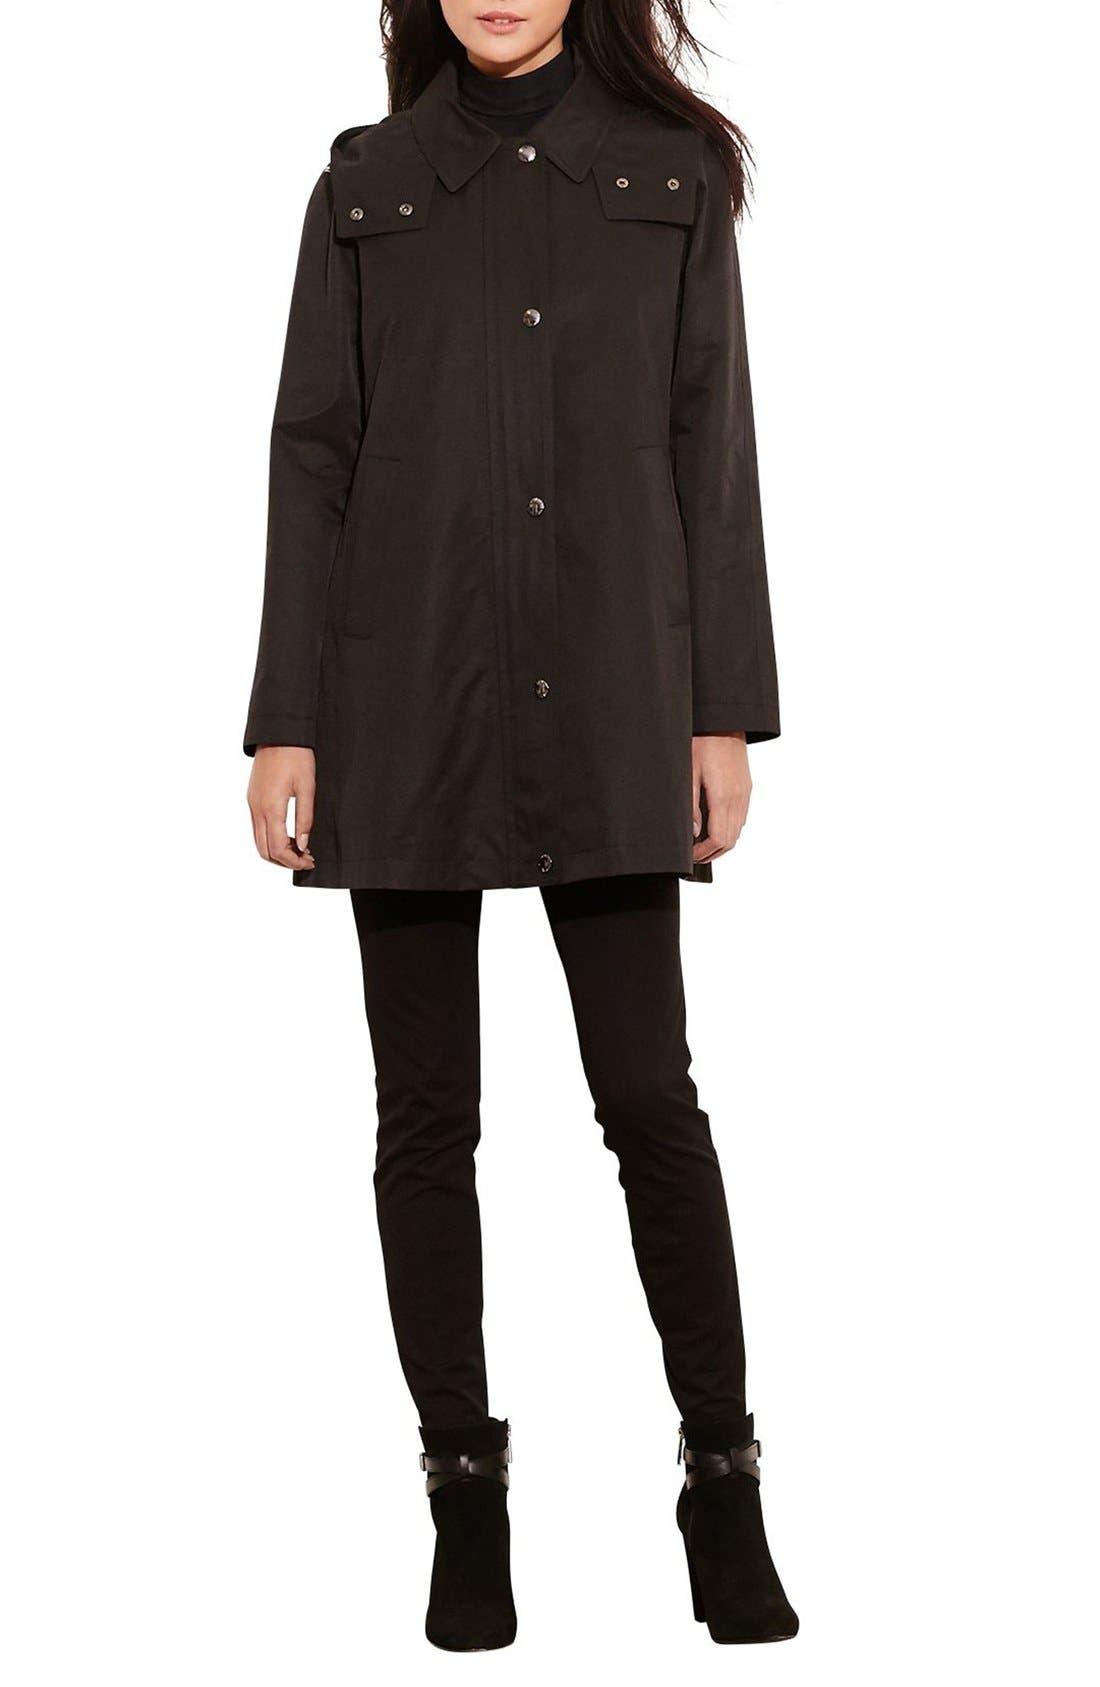 Main Image - Lauren Ralph Lauren A-Line Jacket with Removable Liner